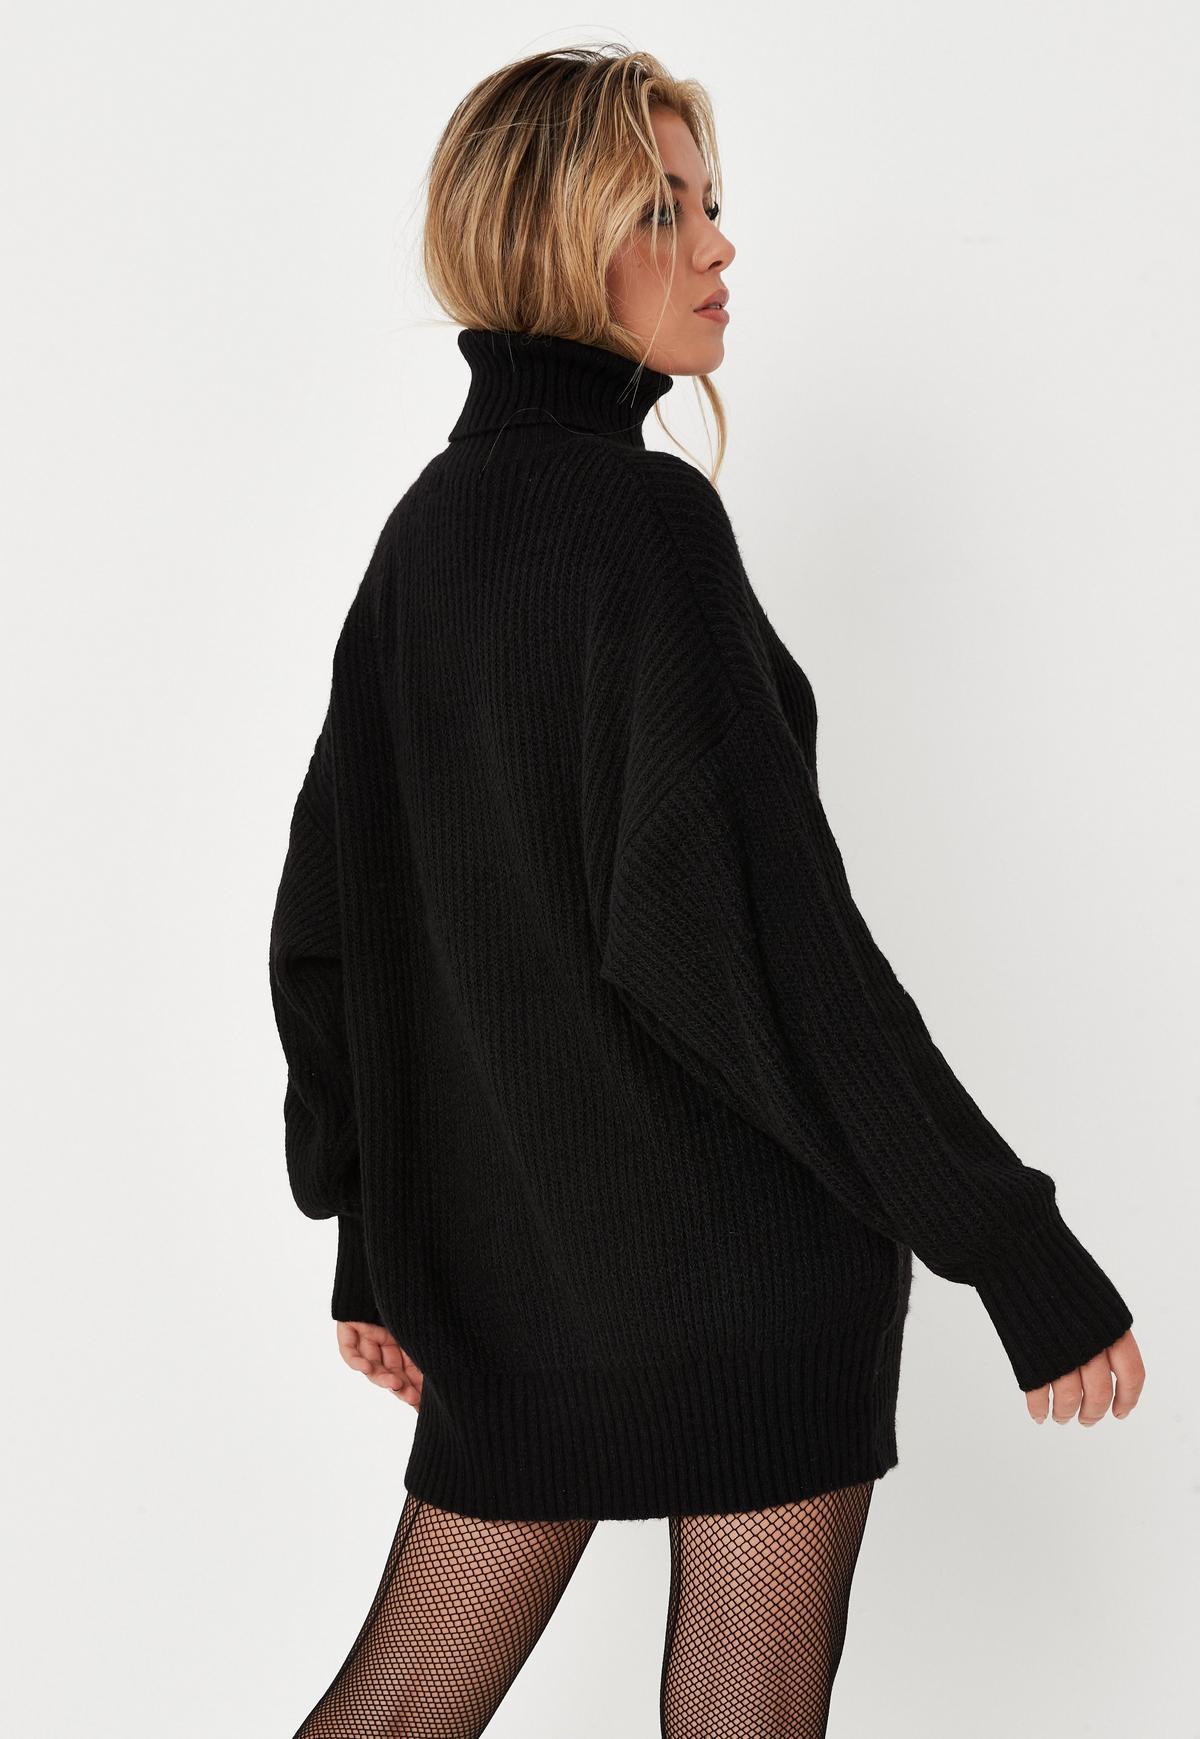 Petite Black Premium Boyfriend Roll Neck Knit Dress  | Missguided